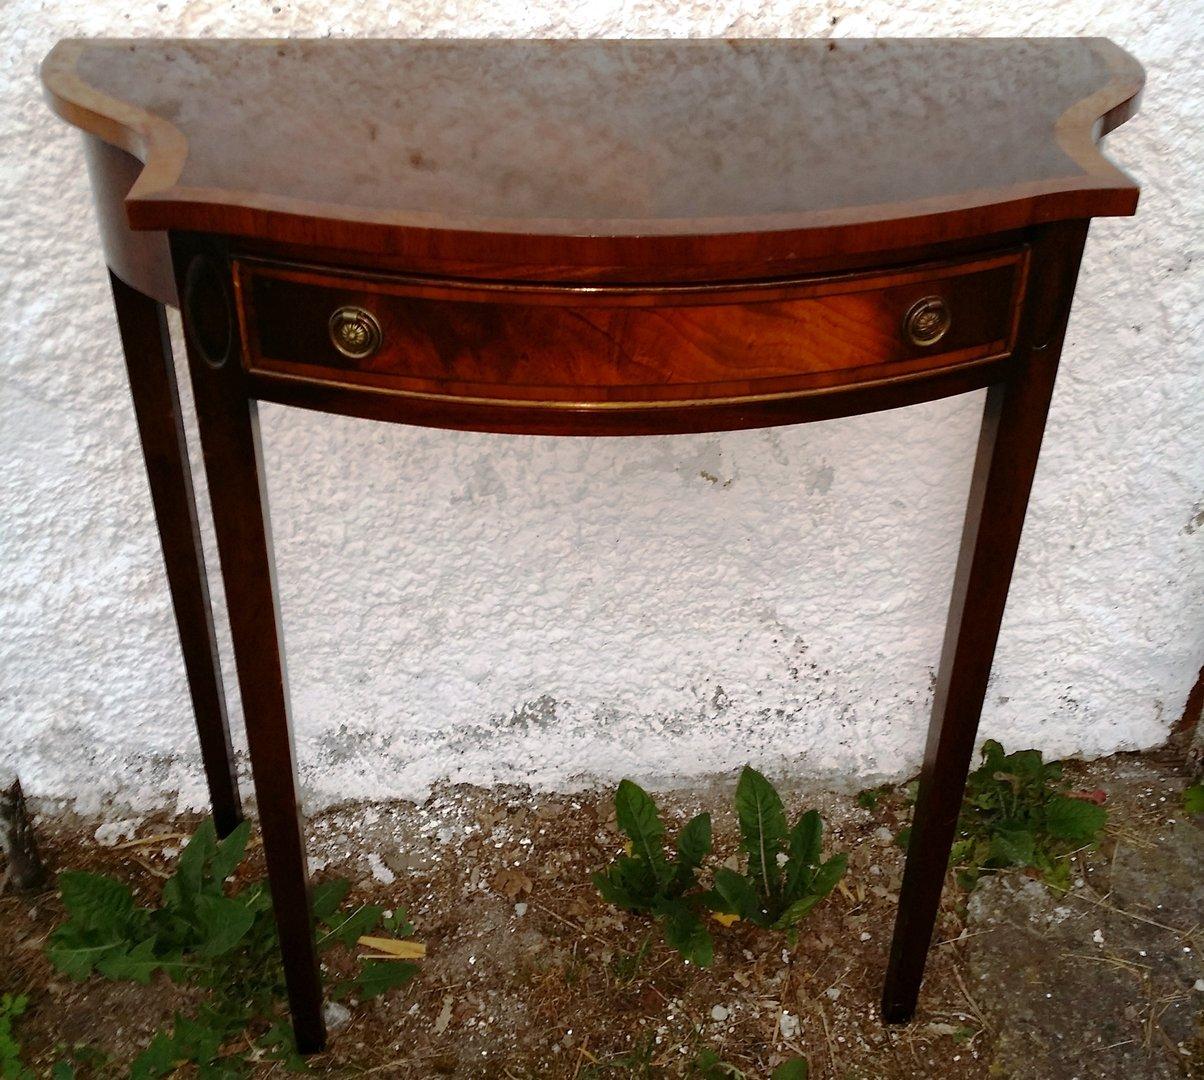 englische mahagoni konsole georgian style antik m bel antiquit ten alling bei m nchen zwischen. Black Bedroom Furniture Sets. Home Design Ideas